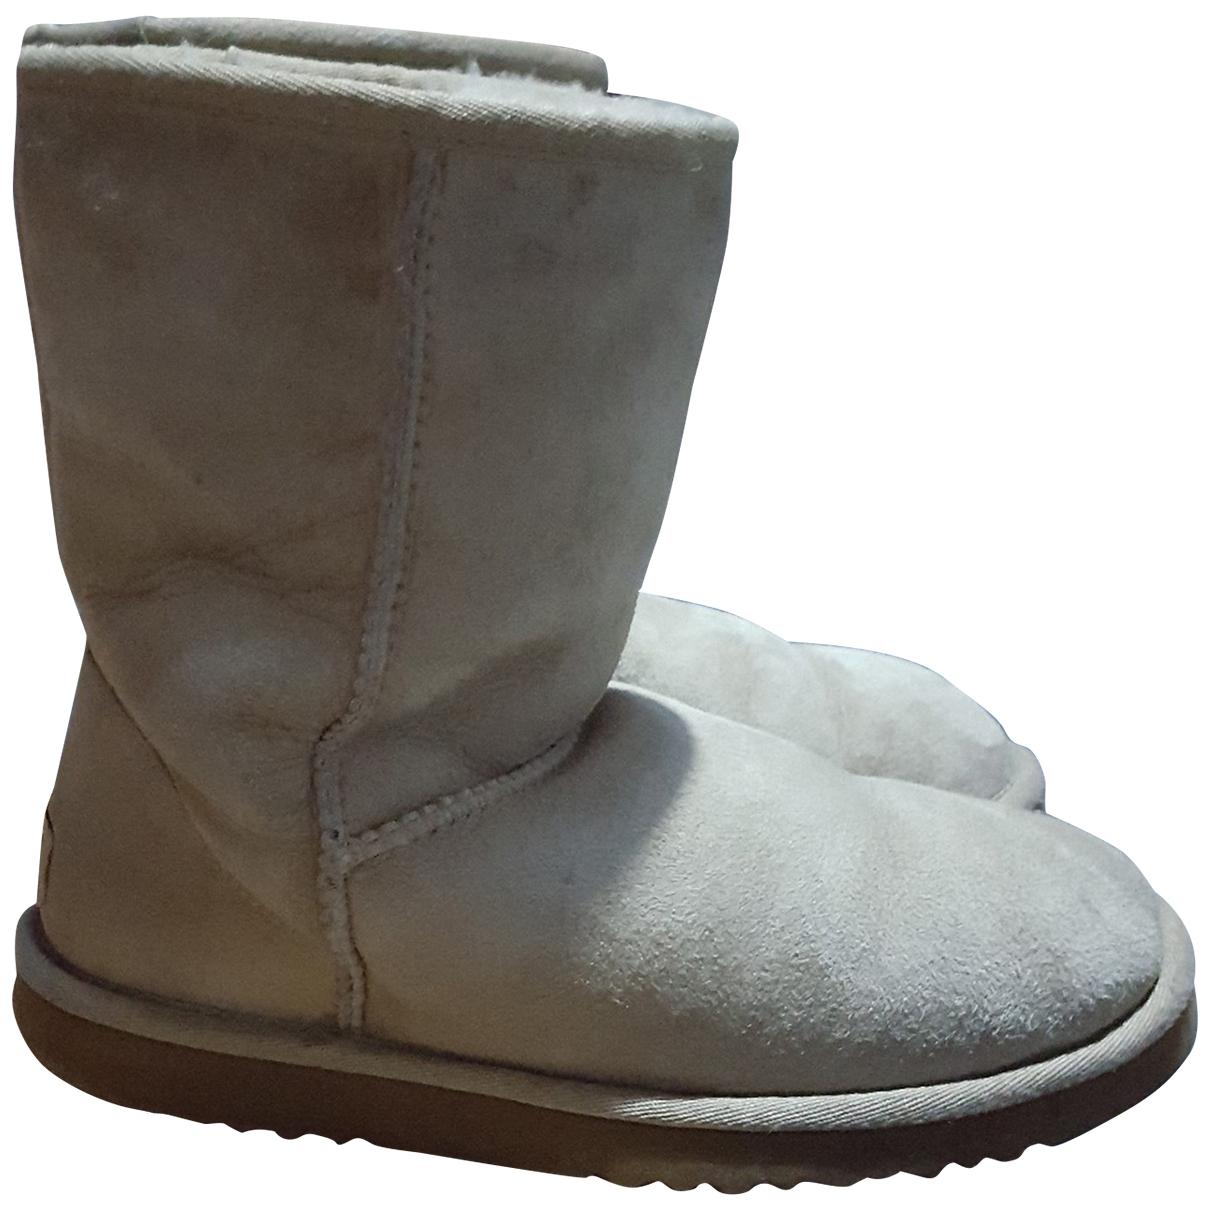 Ugg - Boots   pour femme en suede - beige